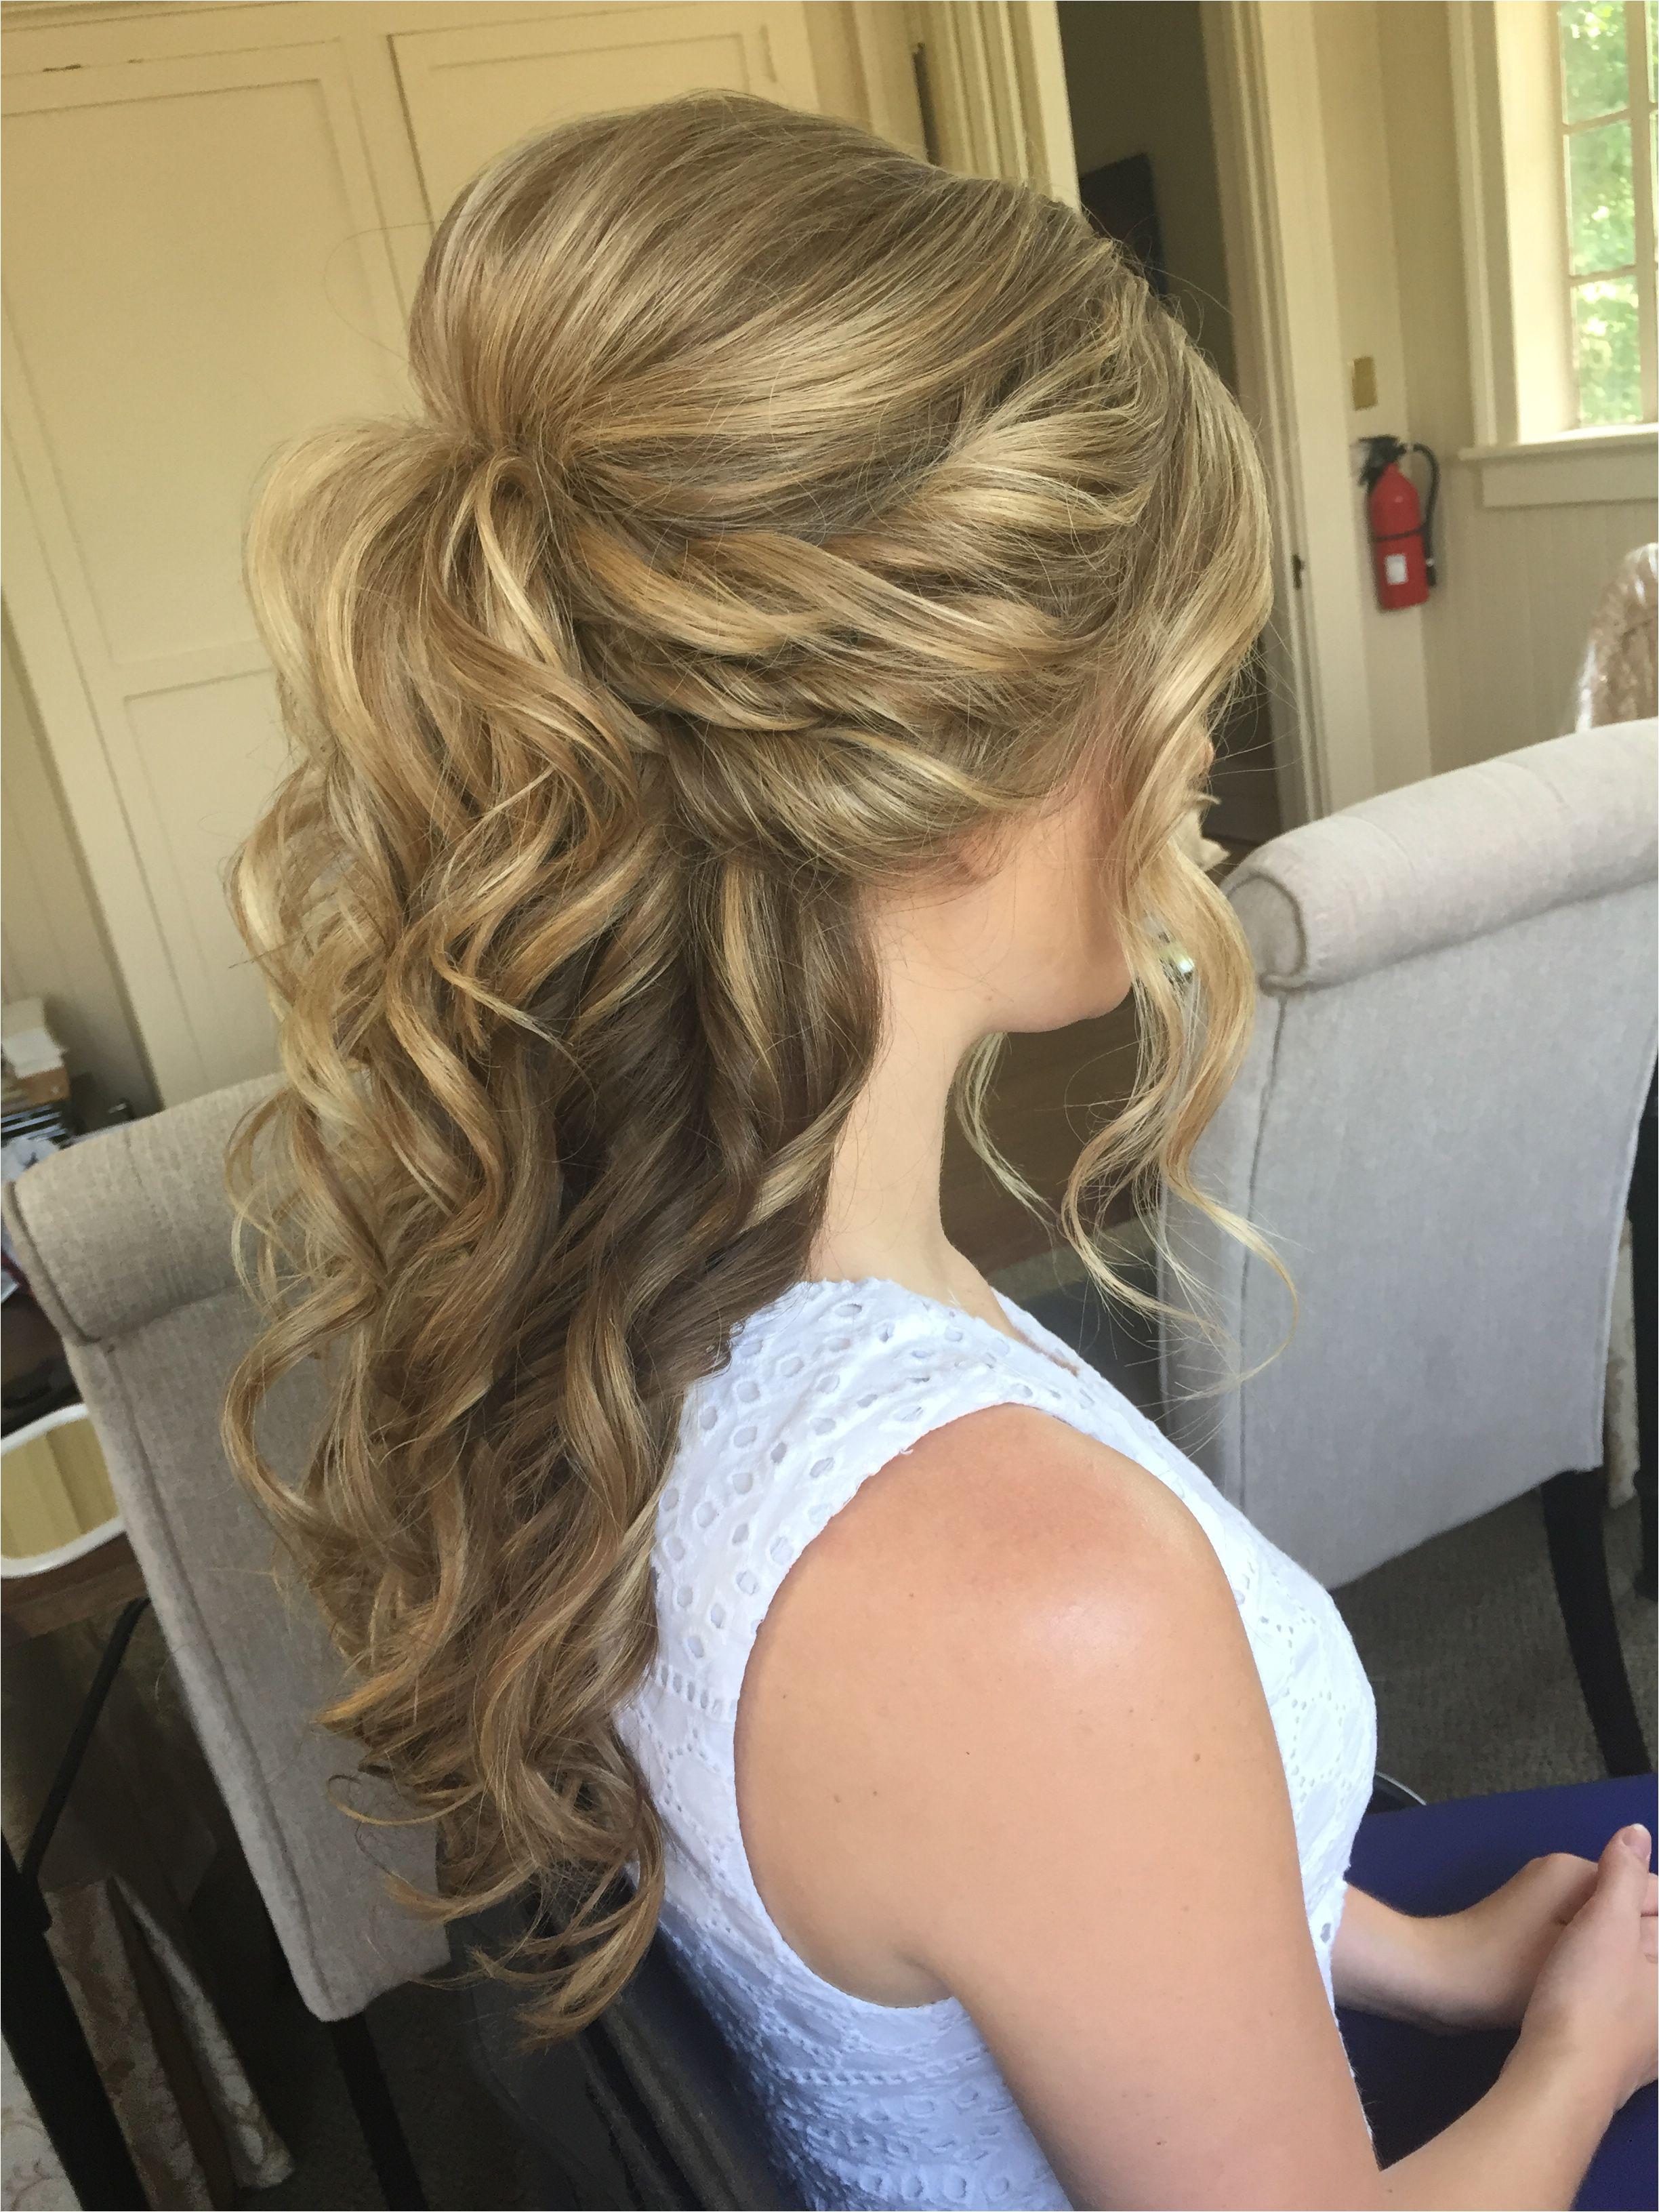 Half Up Half Down Hairstyles Wedding Pinterest Luxury Pin Od Inside Half Updos for Medium Hair